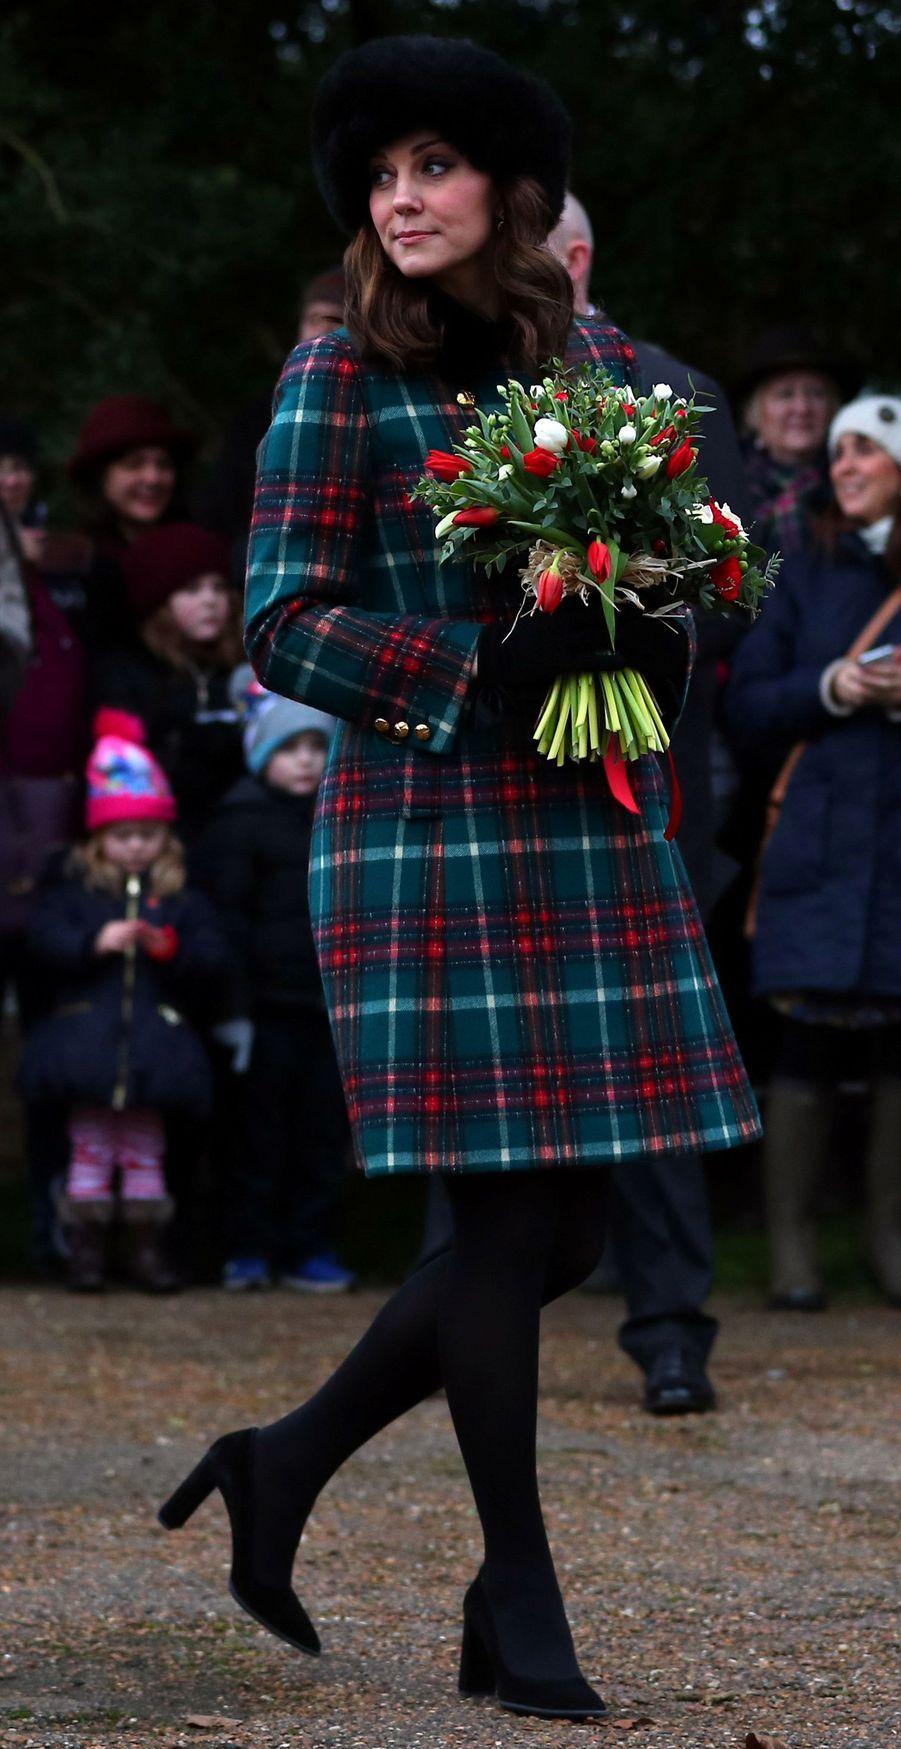 La duchesse Catherine de Cambridge en Miu Miu, le 25 décembre 2017